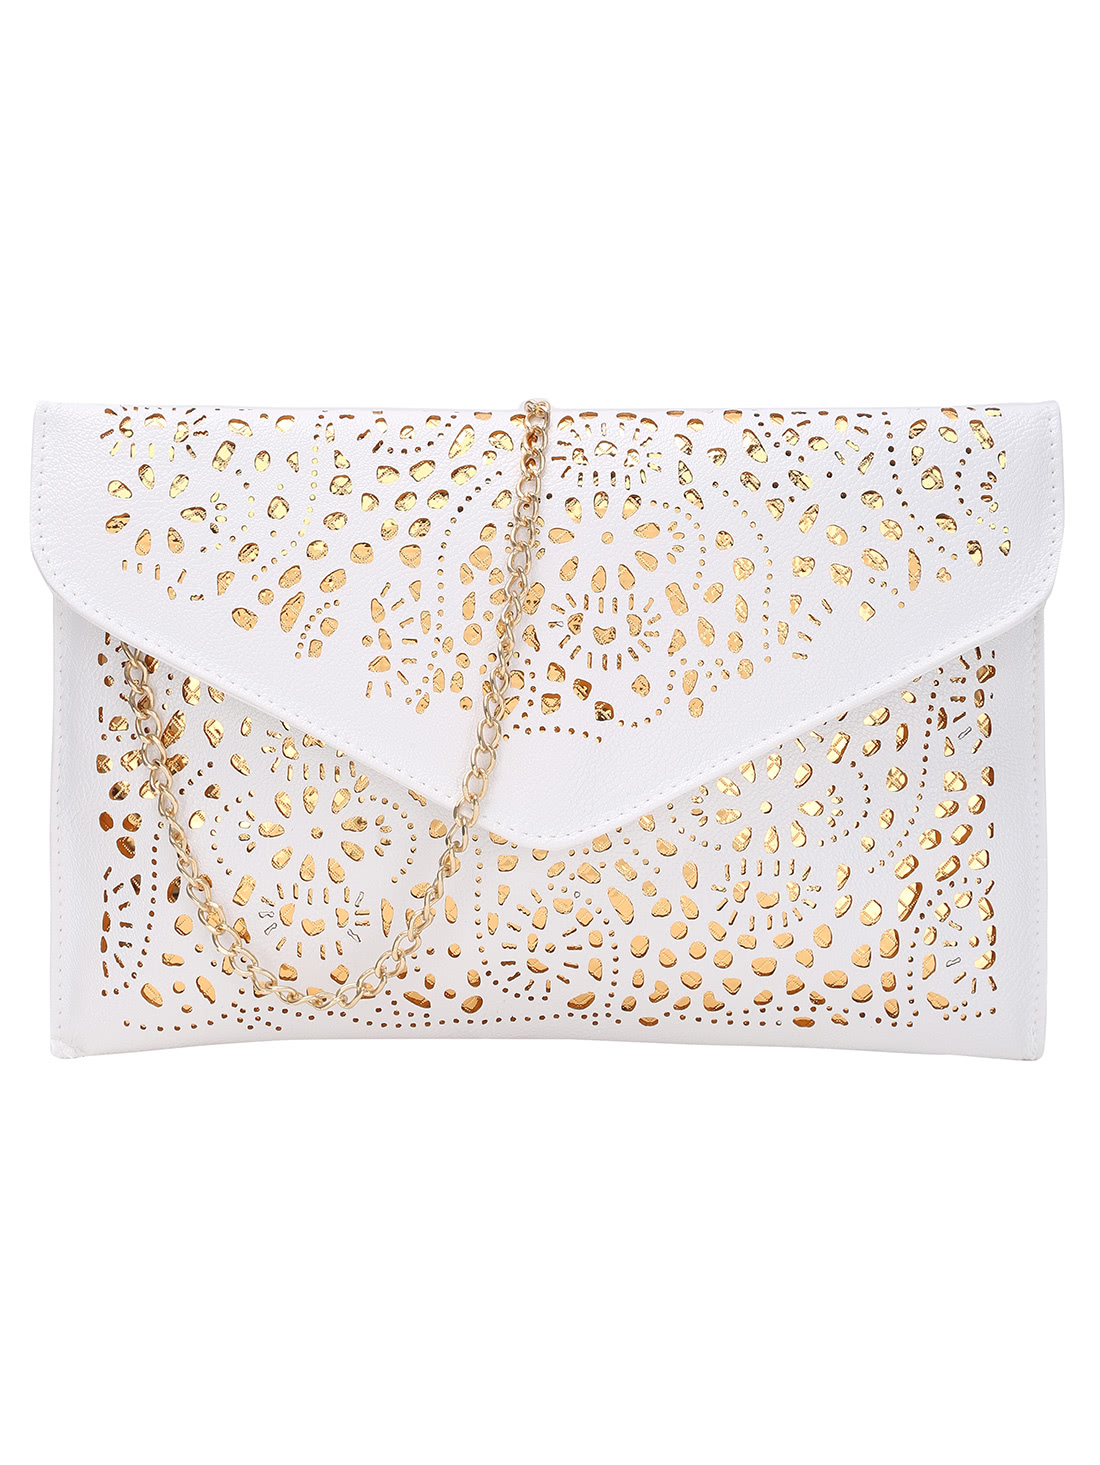 Laser Cut Envelope Clutch With Chain transparent envelope clutch bag